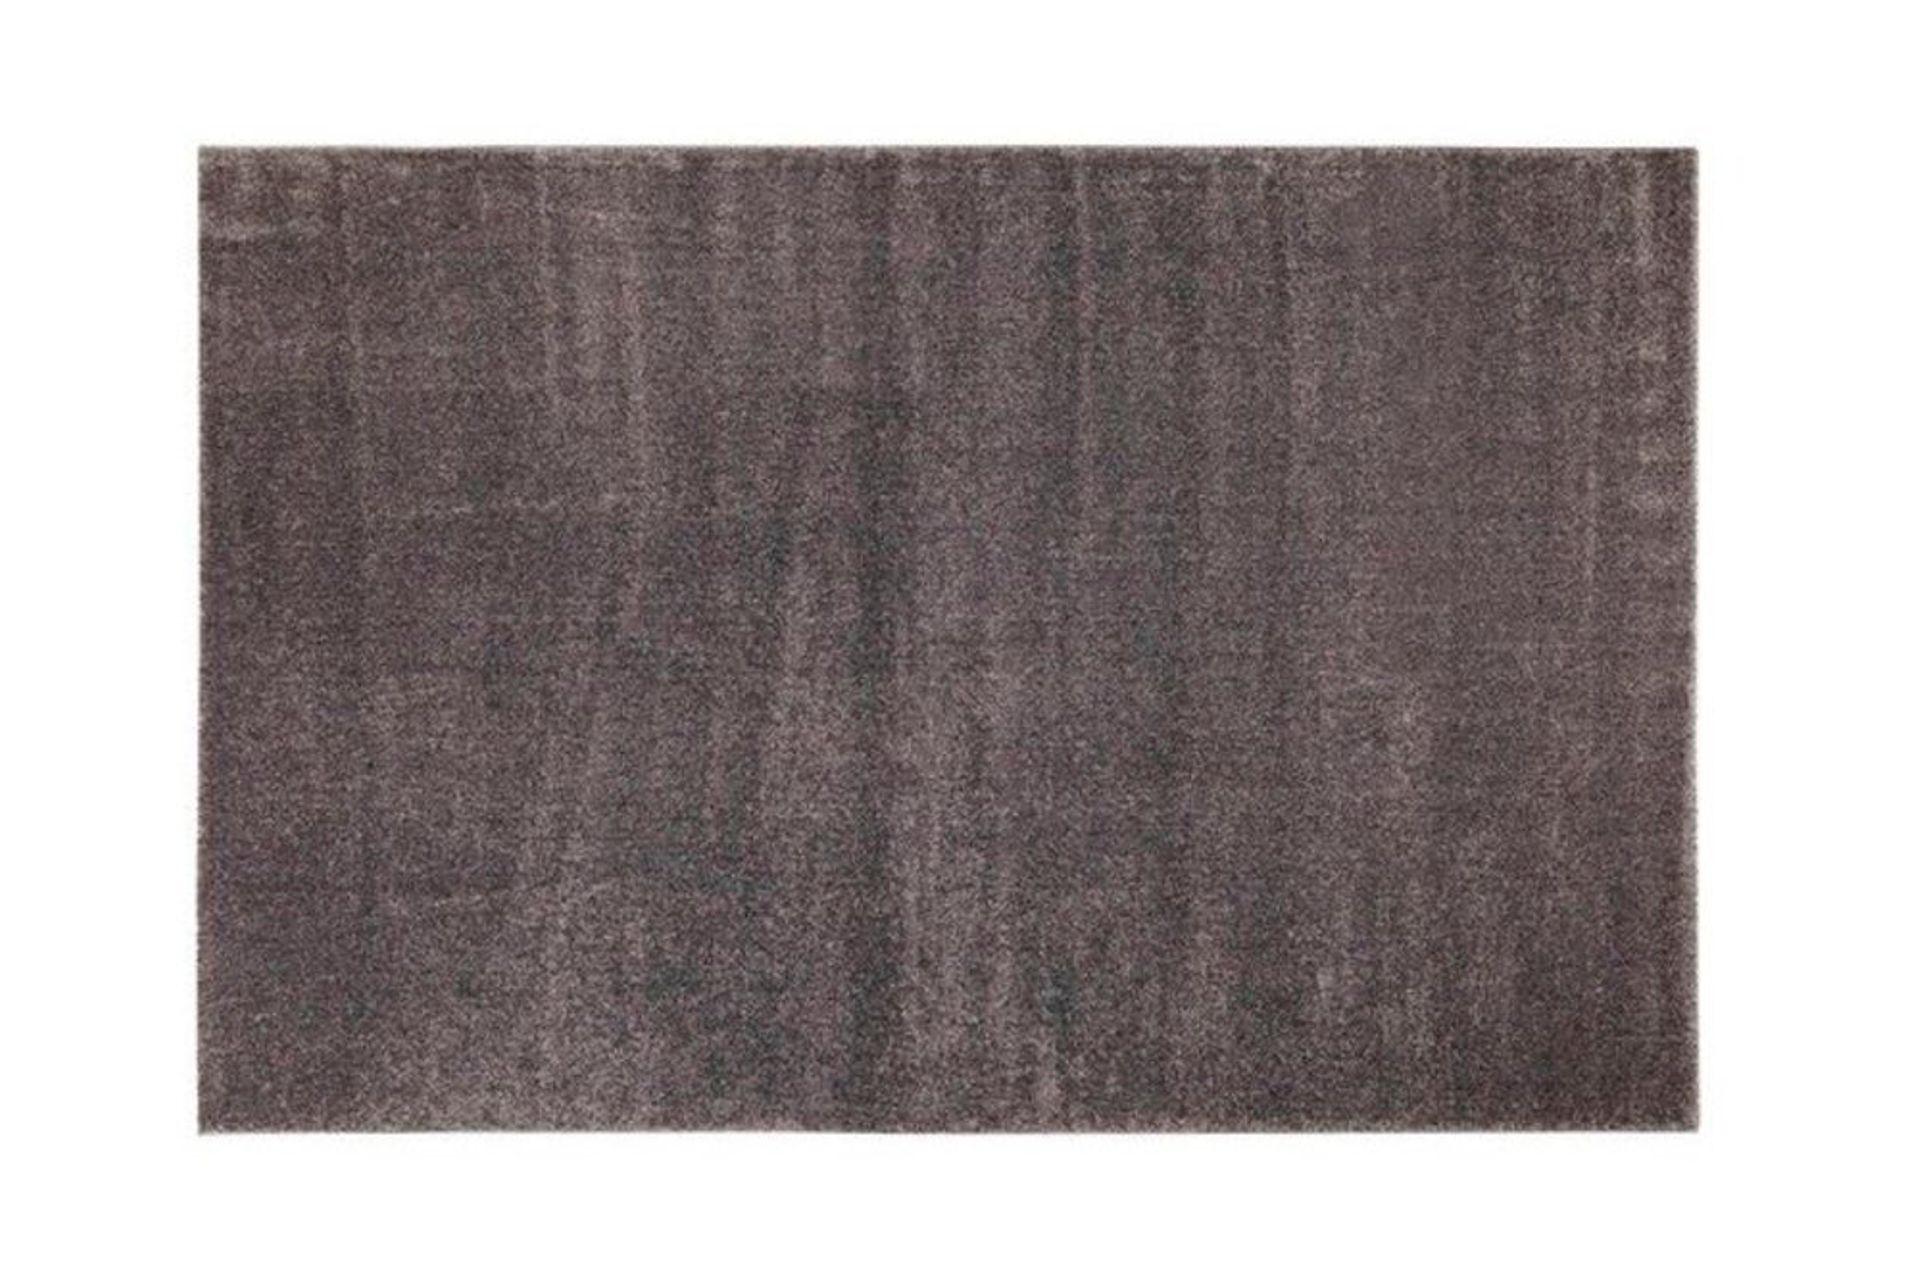 Essence Rug, 80 x 125 cm, Anthracite Grey